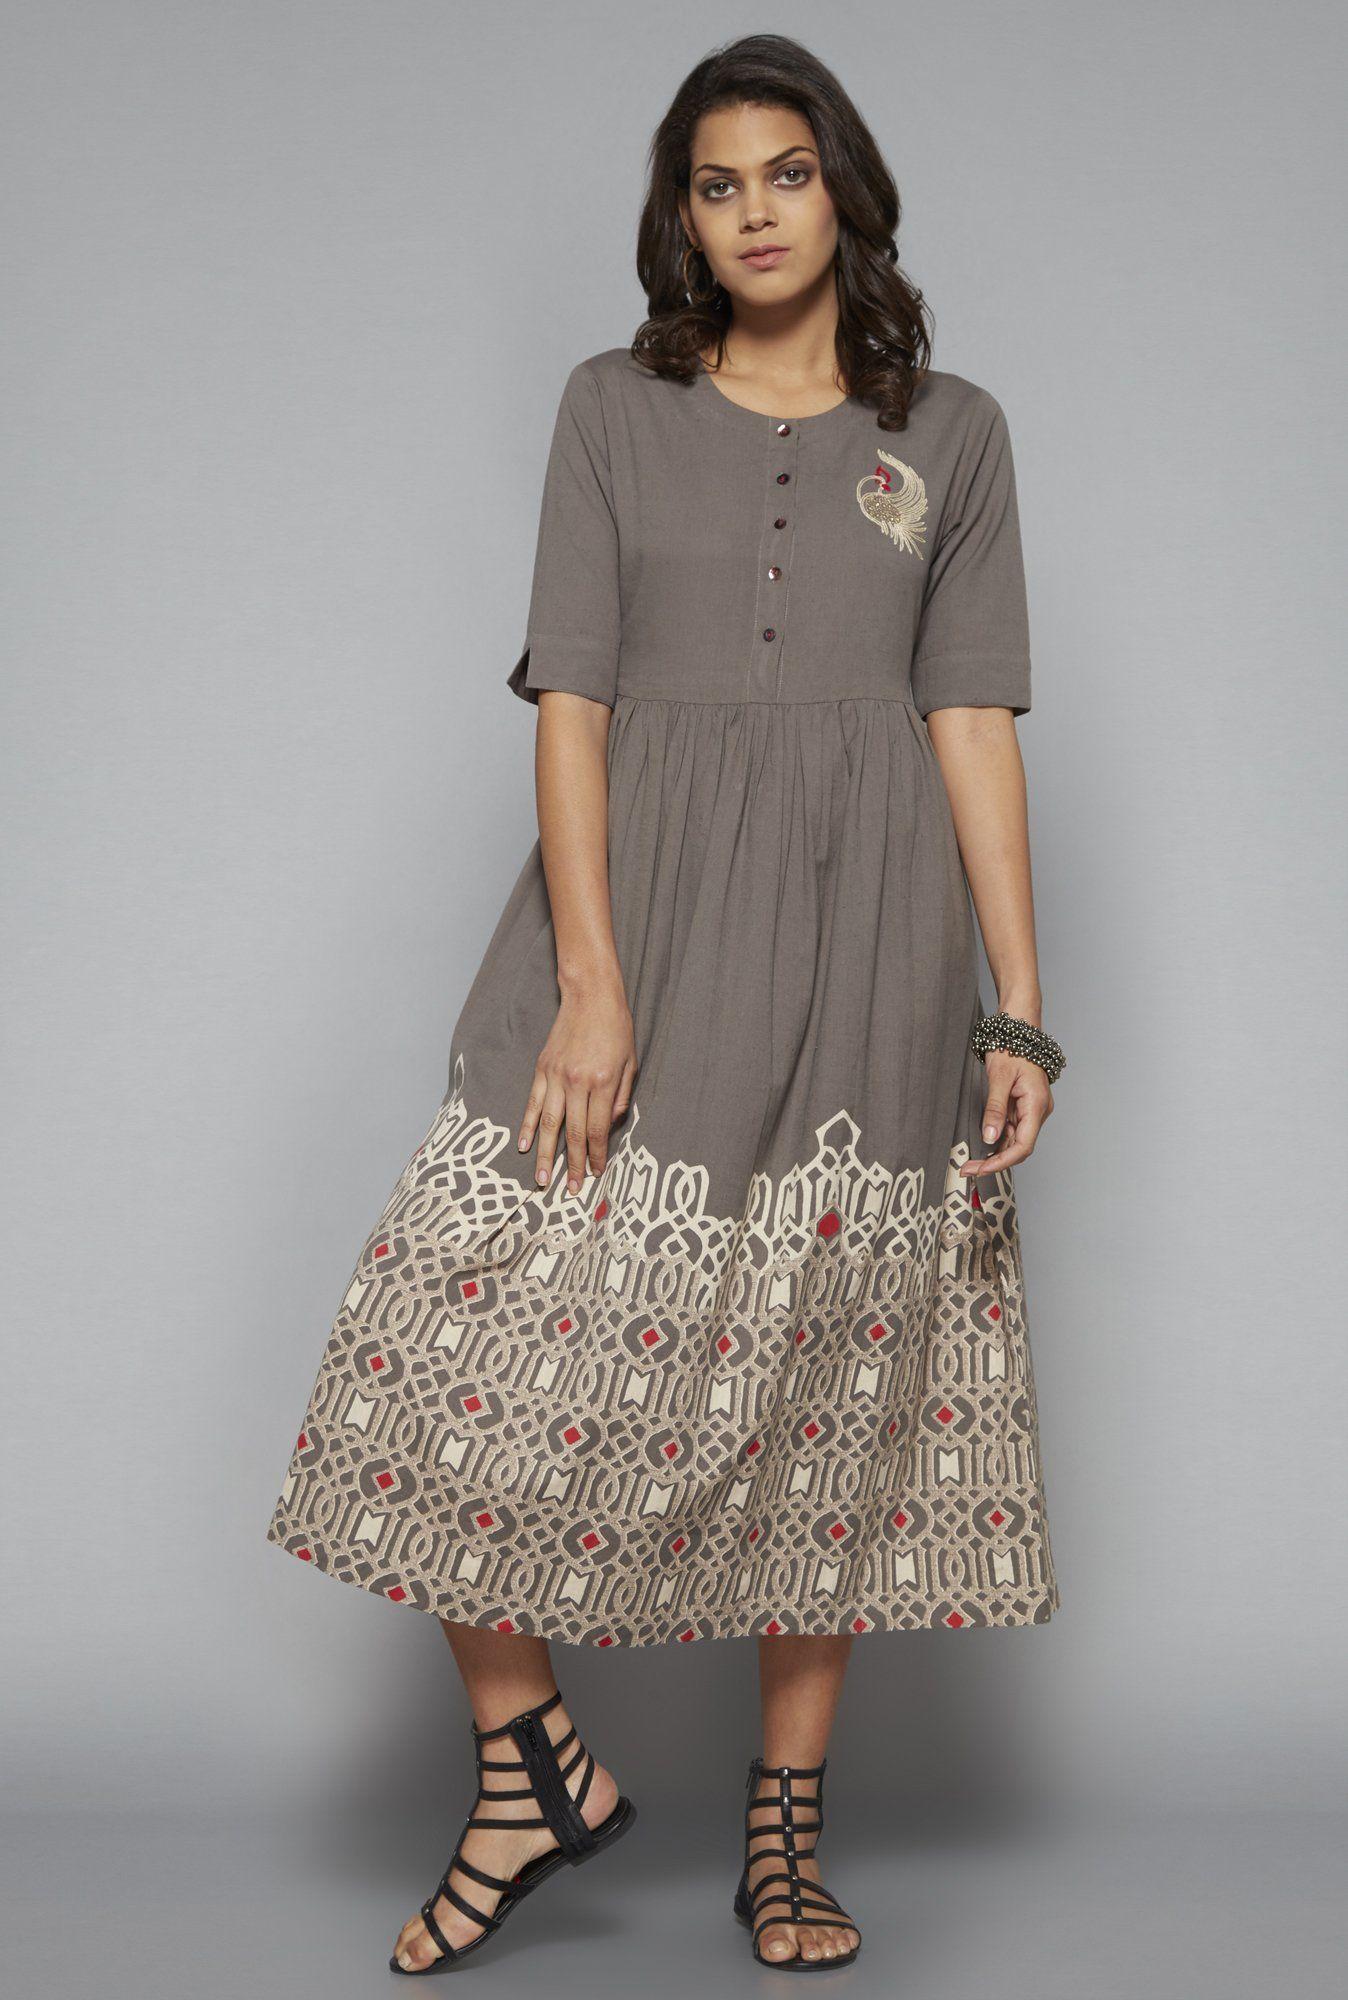 ce5fe94e74ed0 Bombay Paisley by Westside Grey Dress